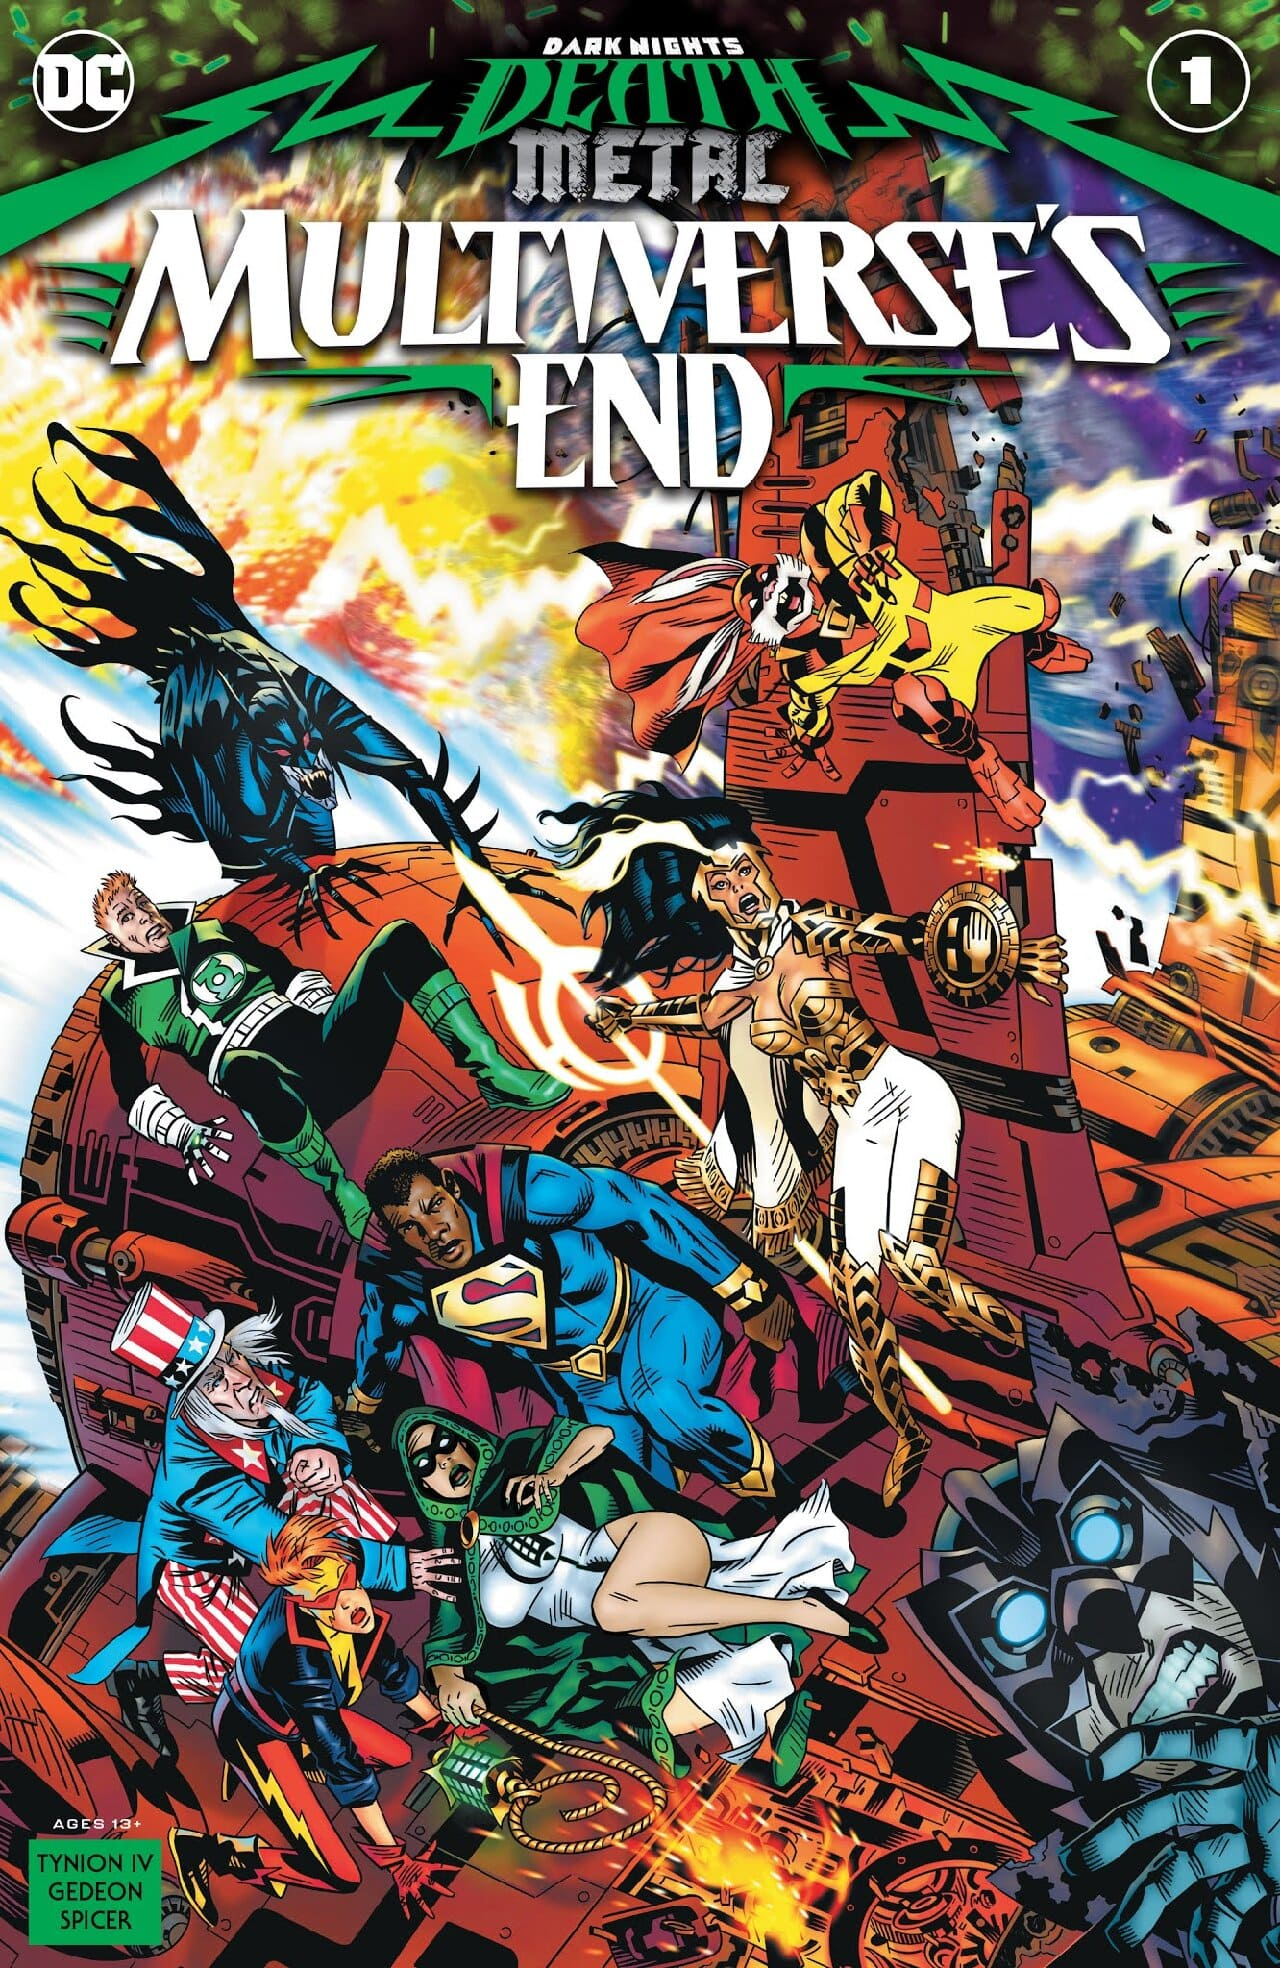 dc comics superman negro multiverse's end